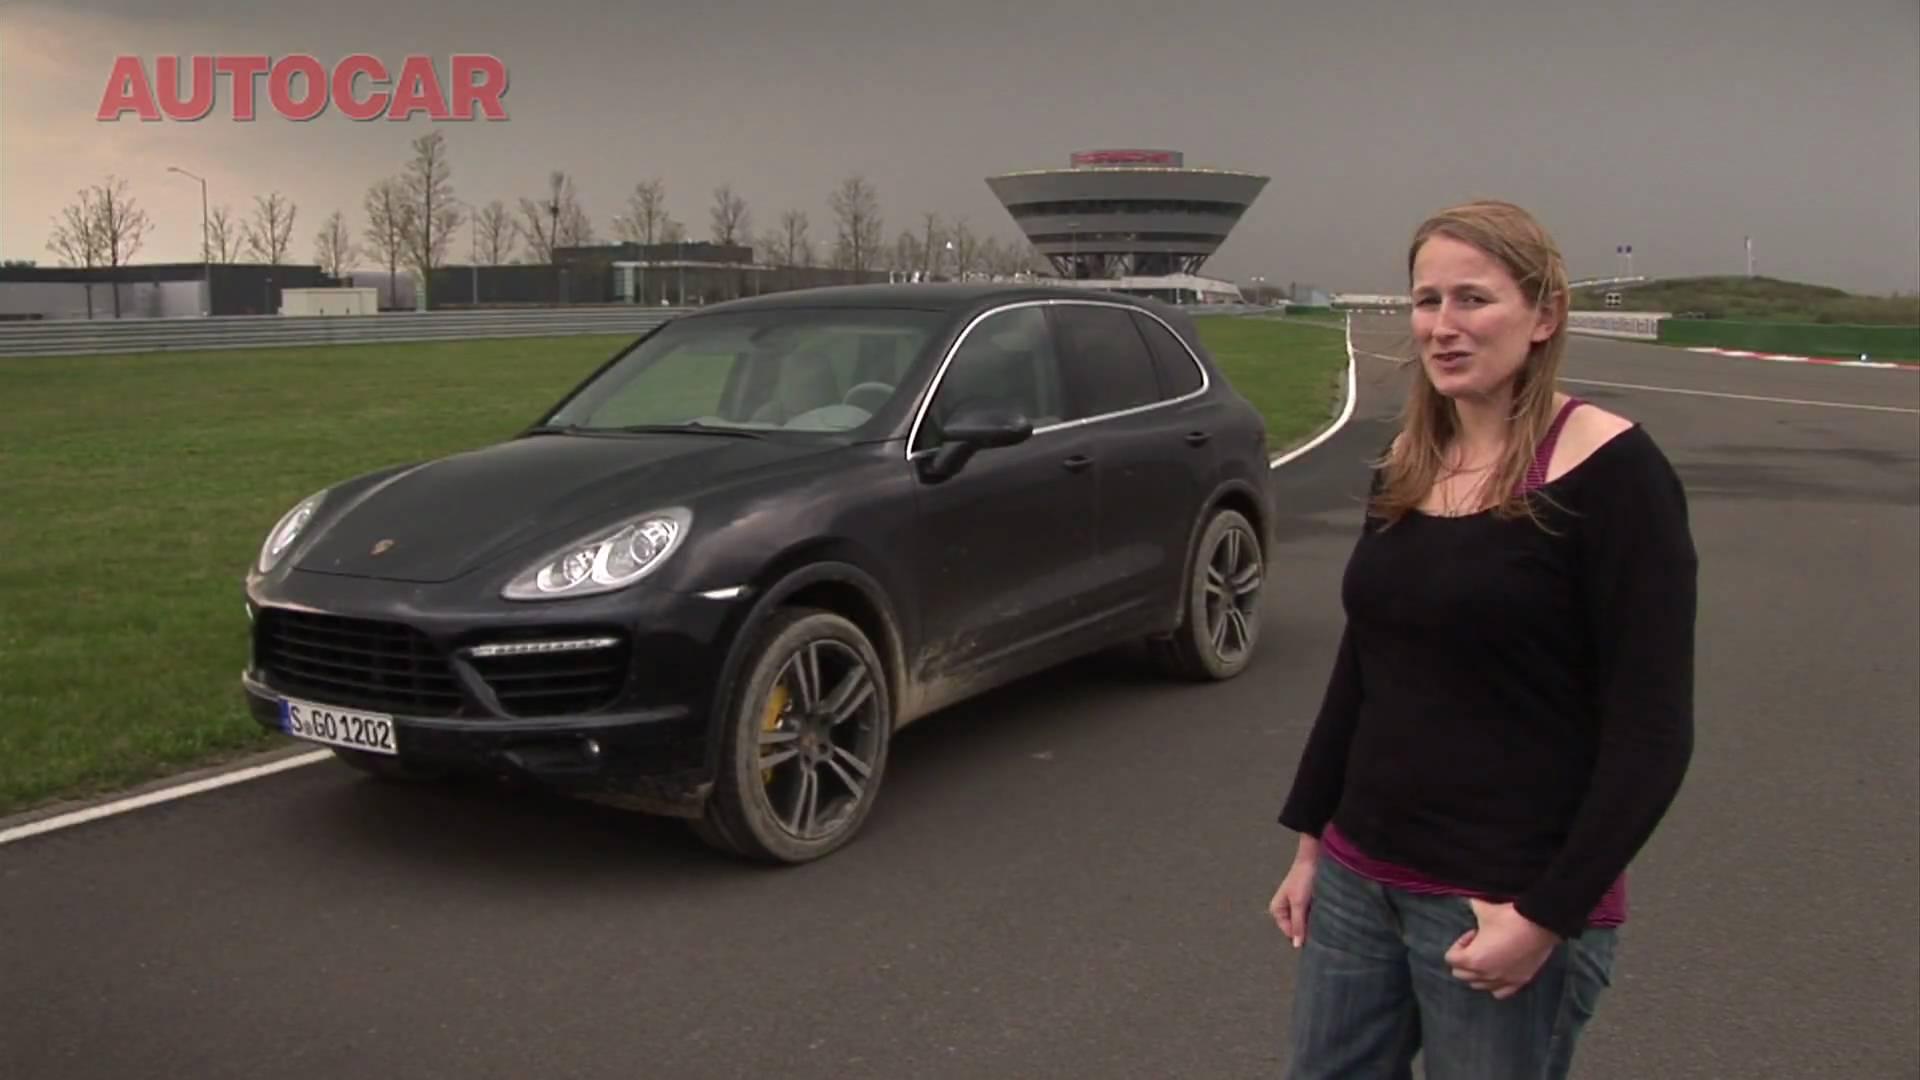 Porsche Cayenne drive review by autocar.co.uk